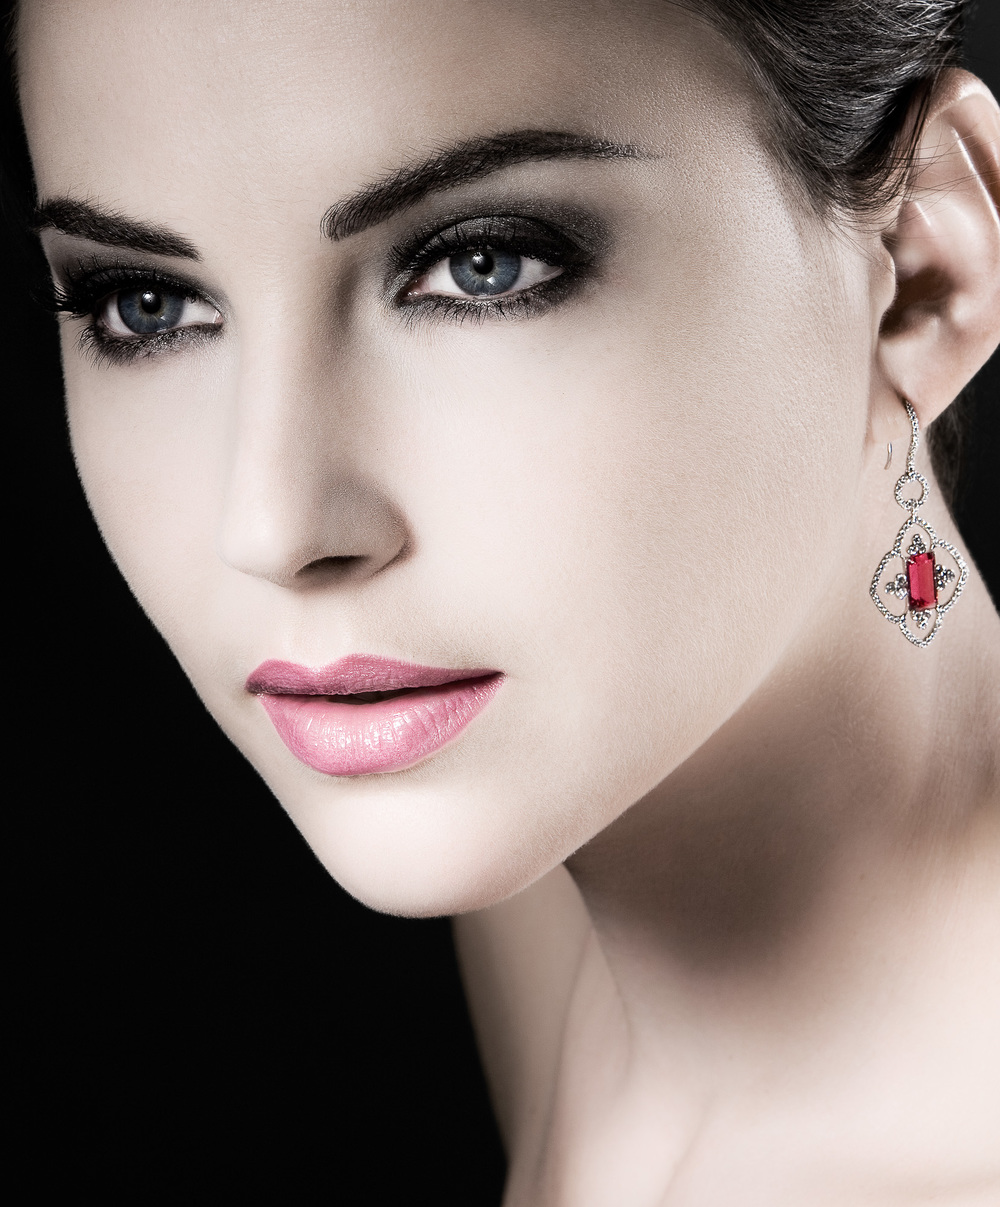 SK-Jewelry_-0061_SS_var-1c-SQSPC_2000px-sharpHIGH.jpg